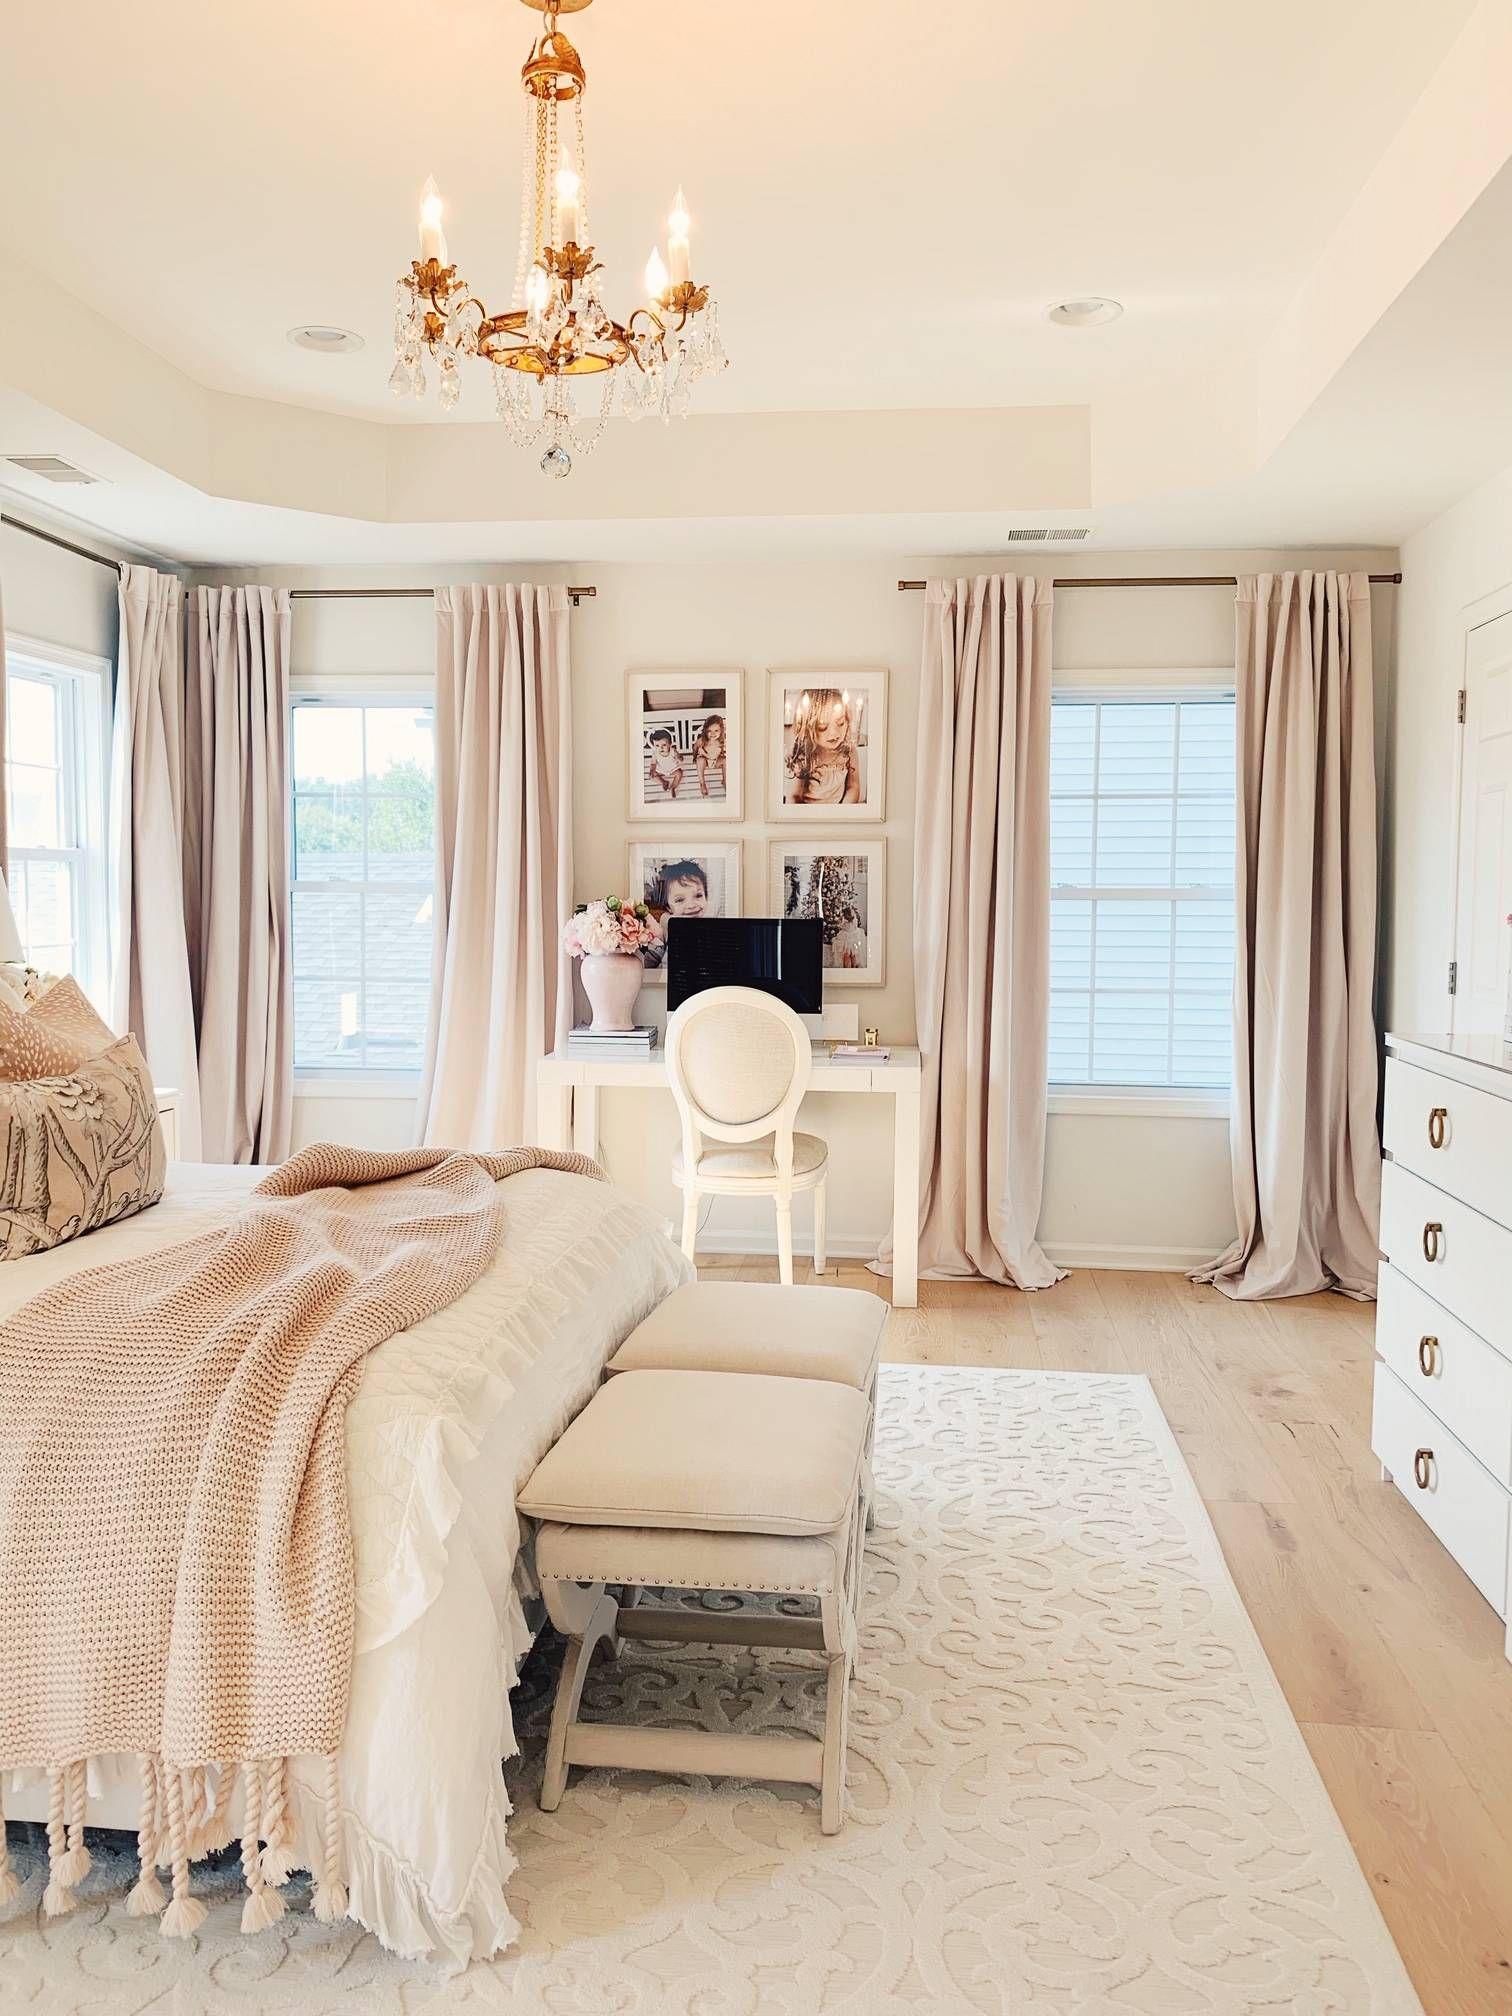 Vintage Chic Walmart Furniture Decor Favorites Master Bedrooms Decor Master Bedroom Makeover Romantic Bedroom Decor